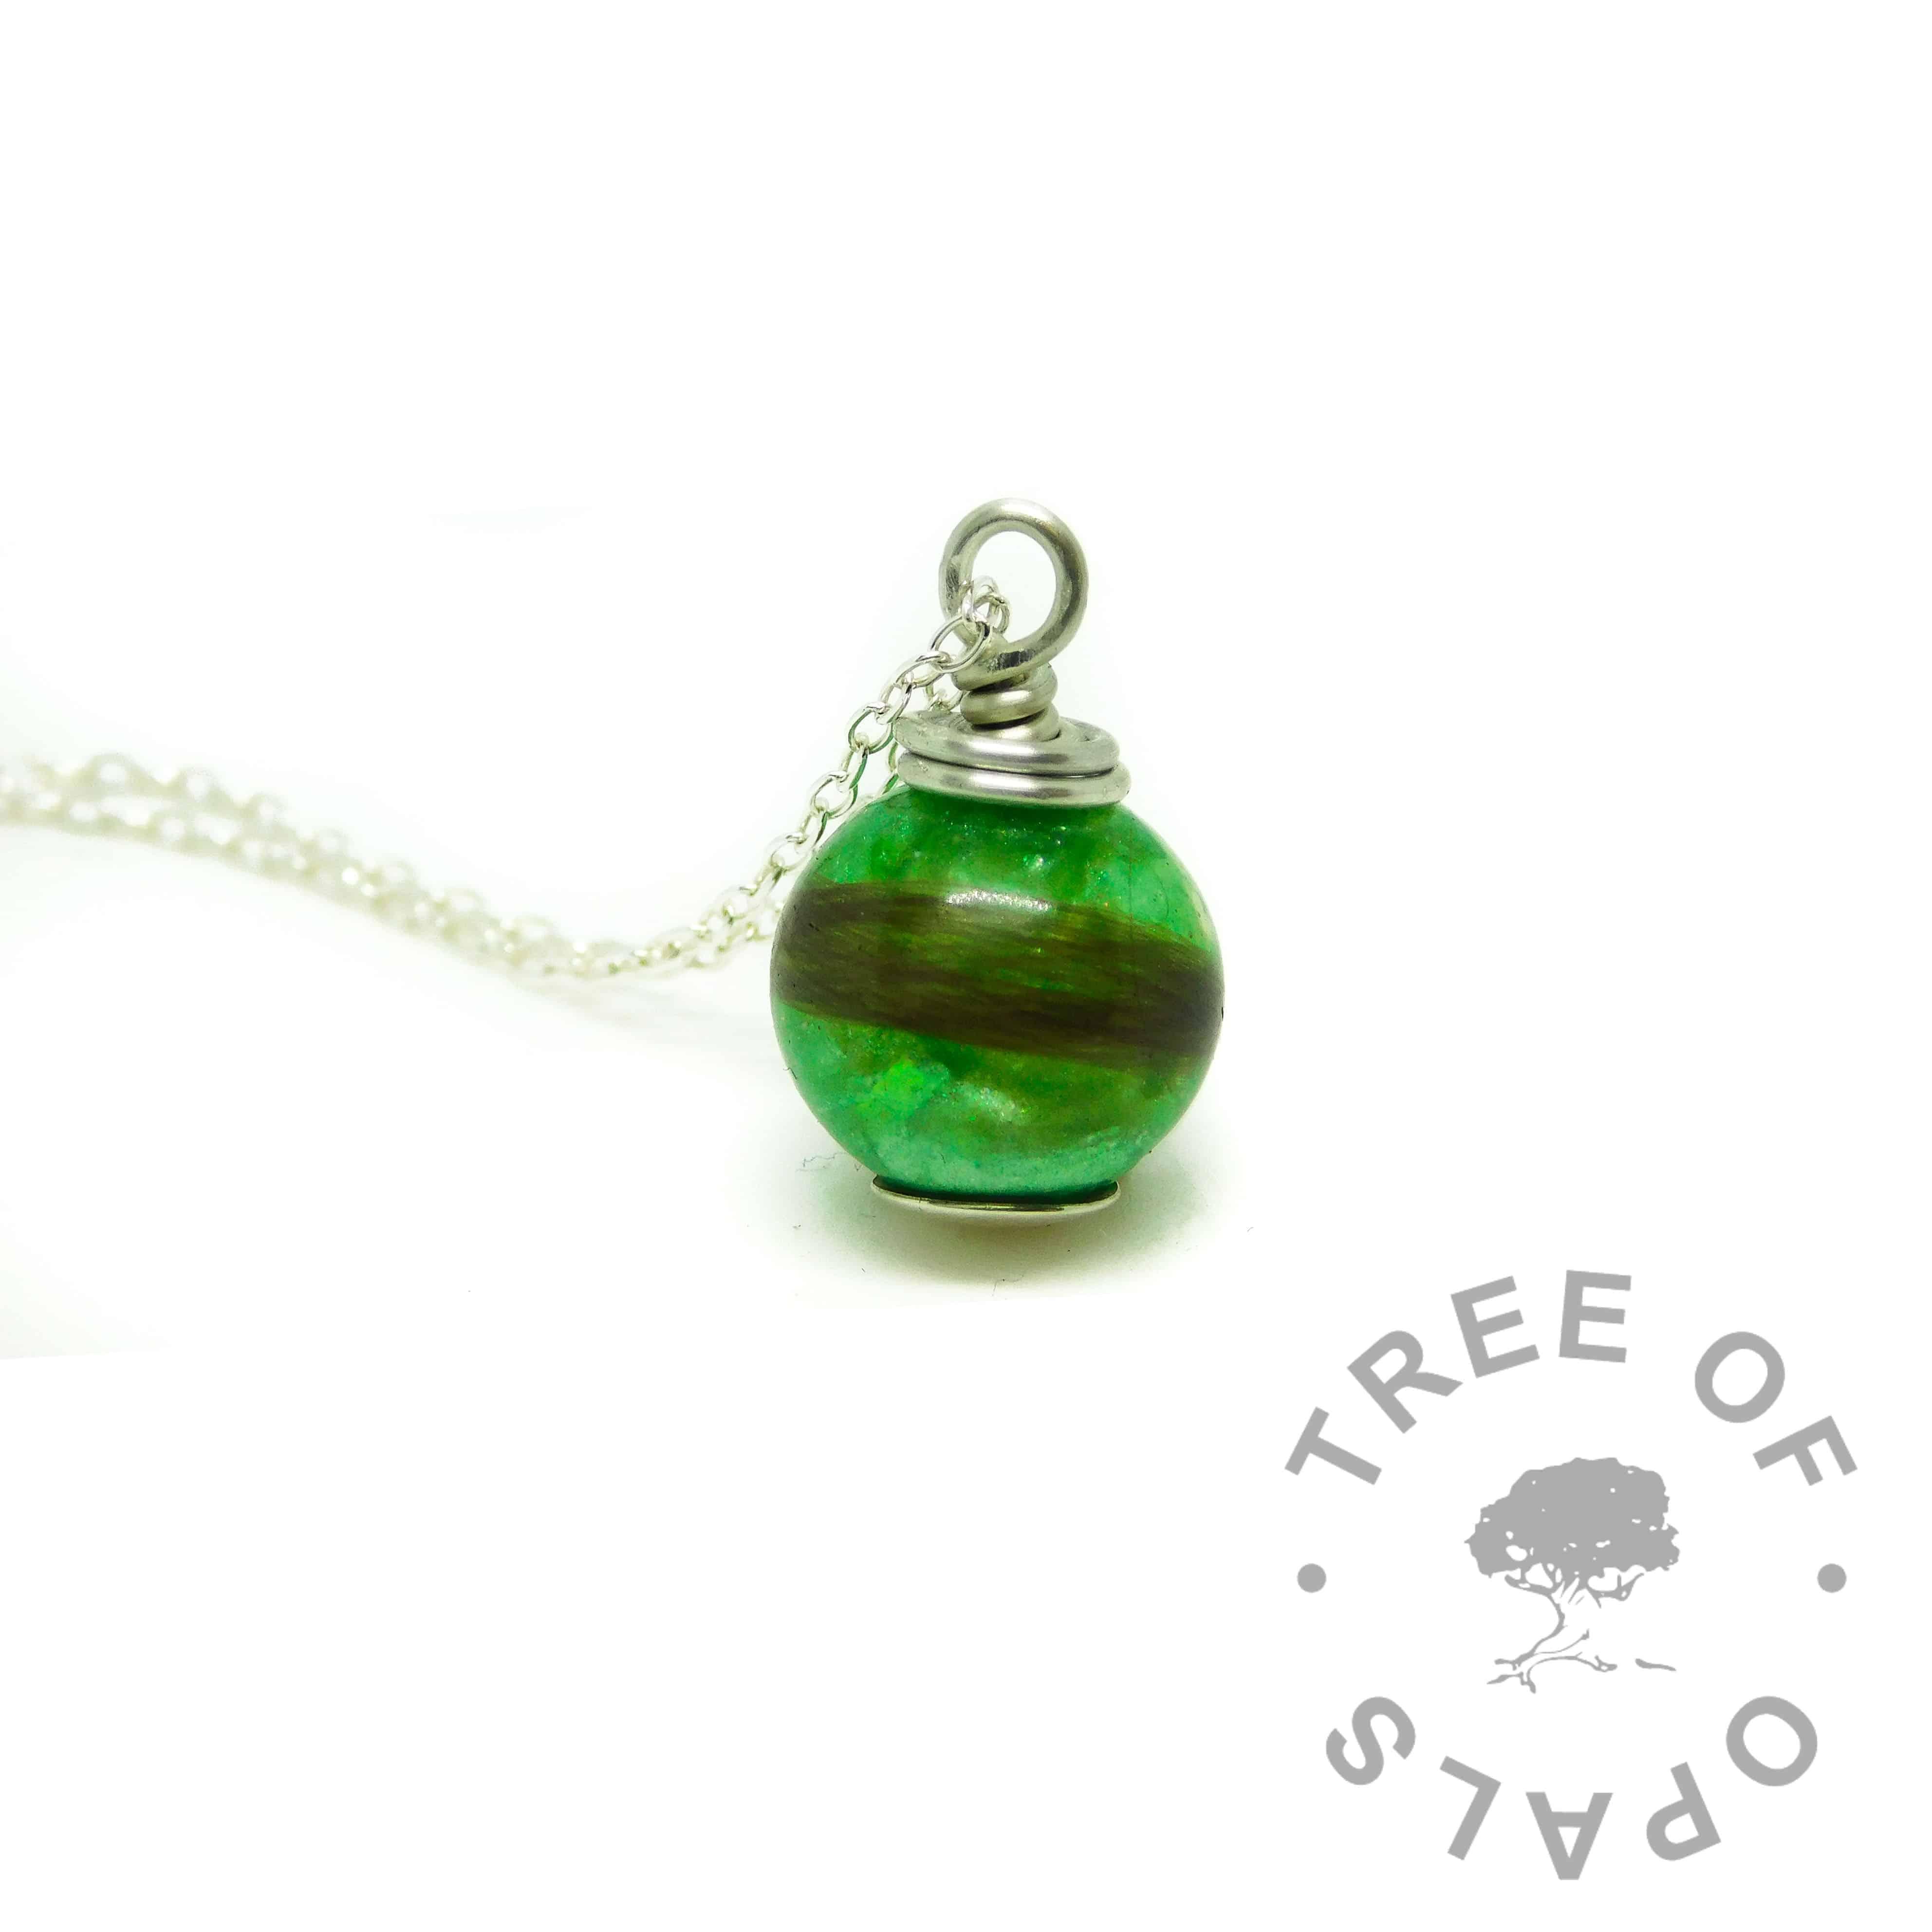 basilisk green lock of hair pearl necklace hair memorial